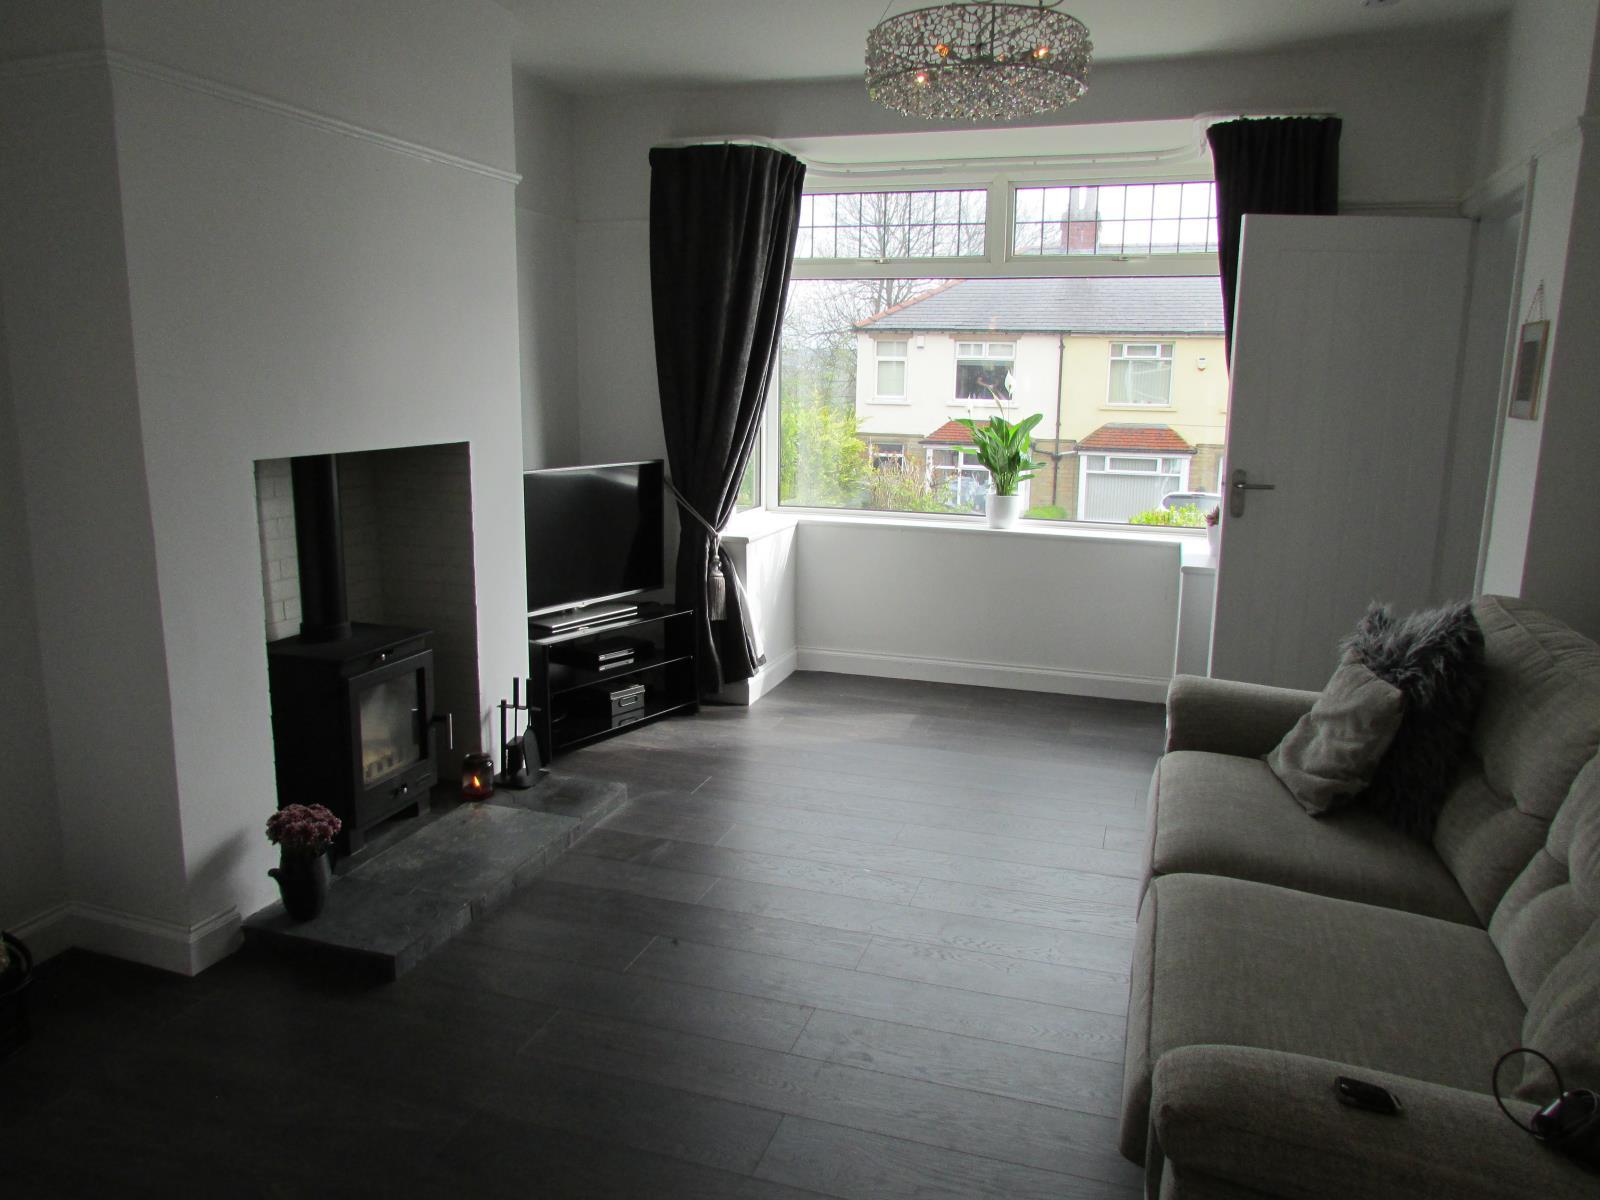 15 Hallas Grove, Dalton, Huddersfield HD5 8ED